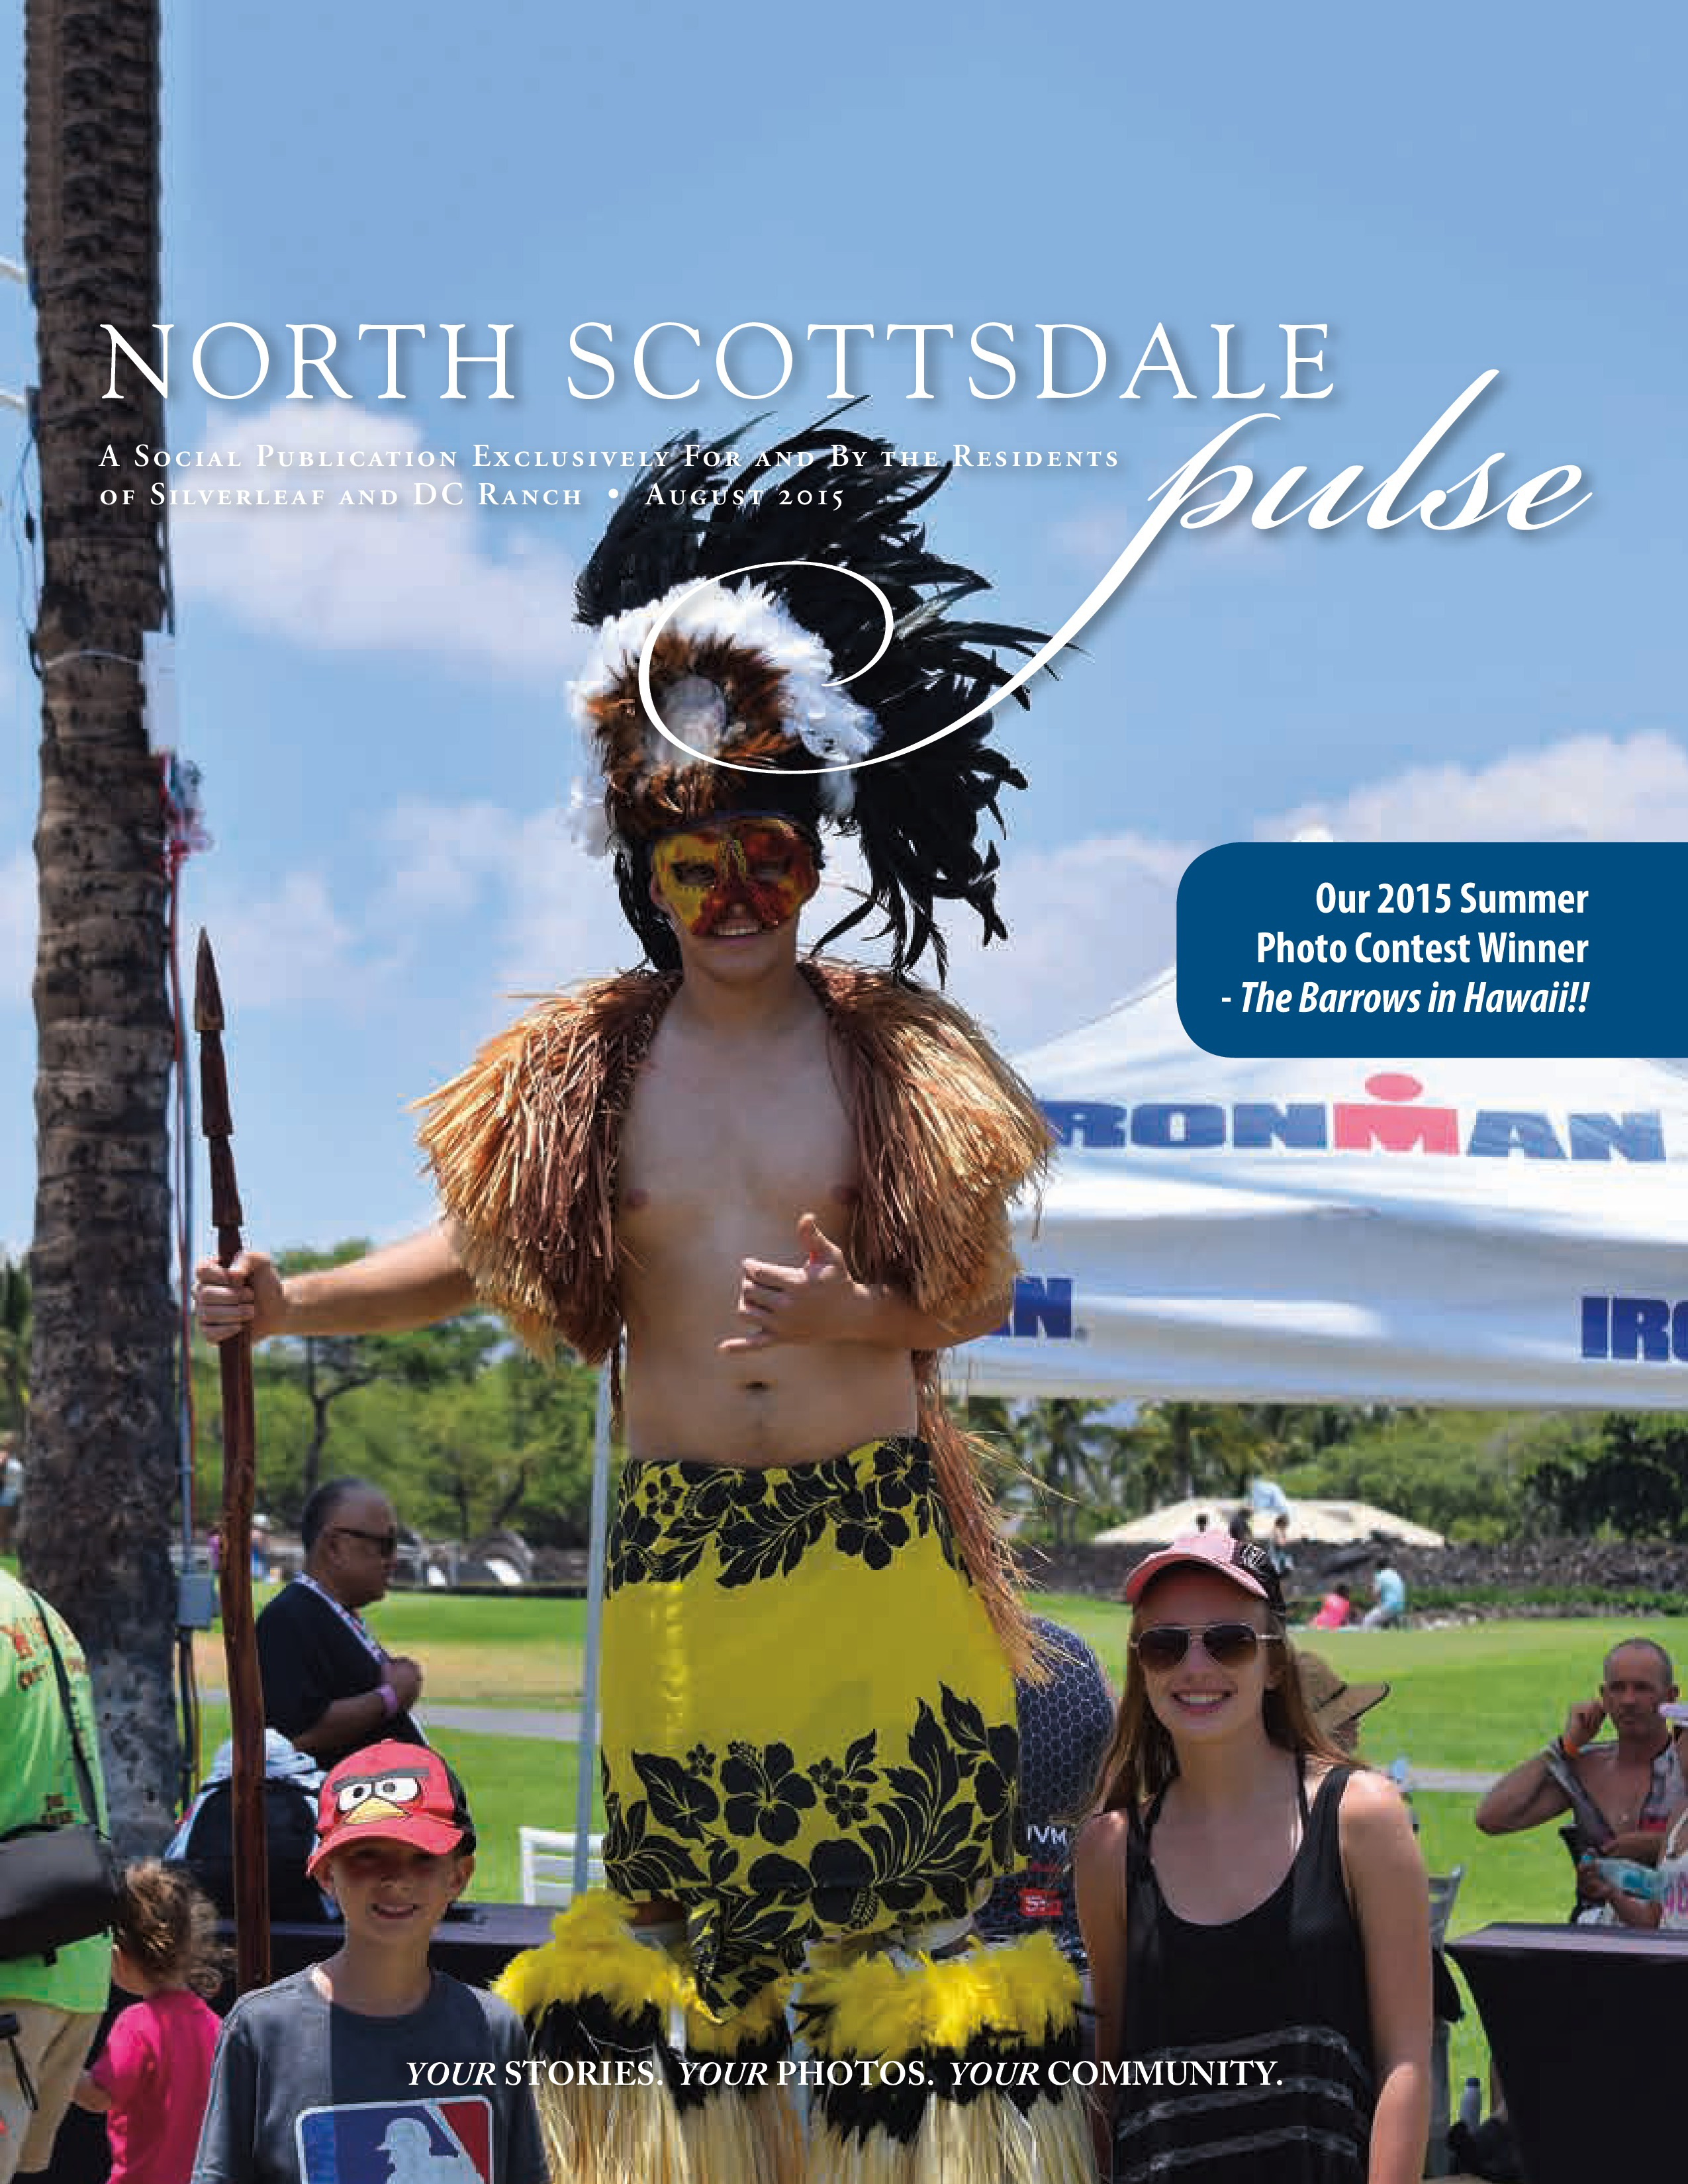 North Scottsdale Pulse August 2015